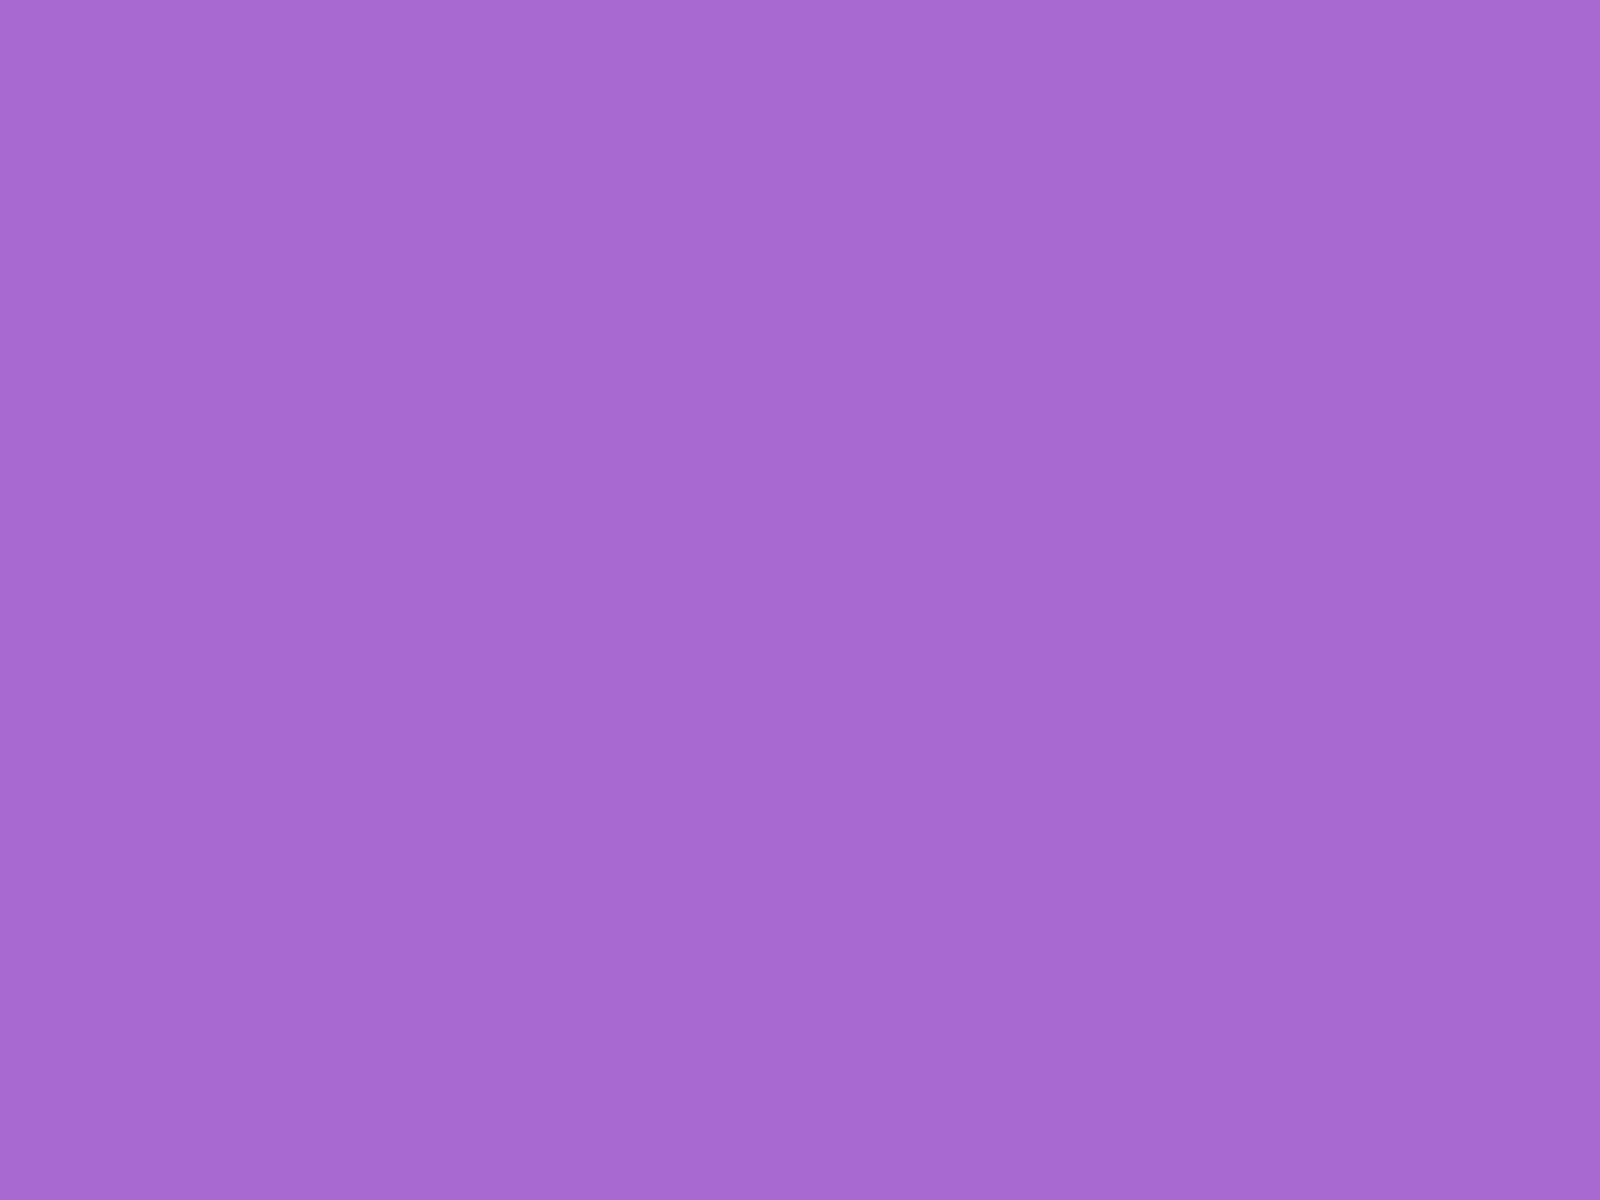 1600x1200 Rich Lavender Solid Color Background